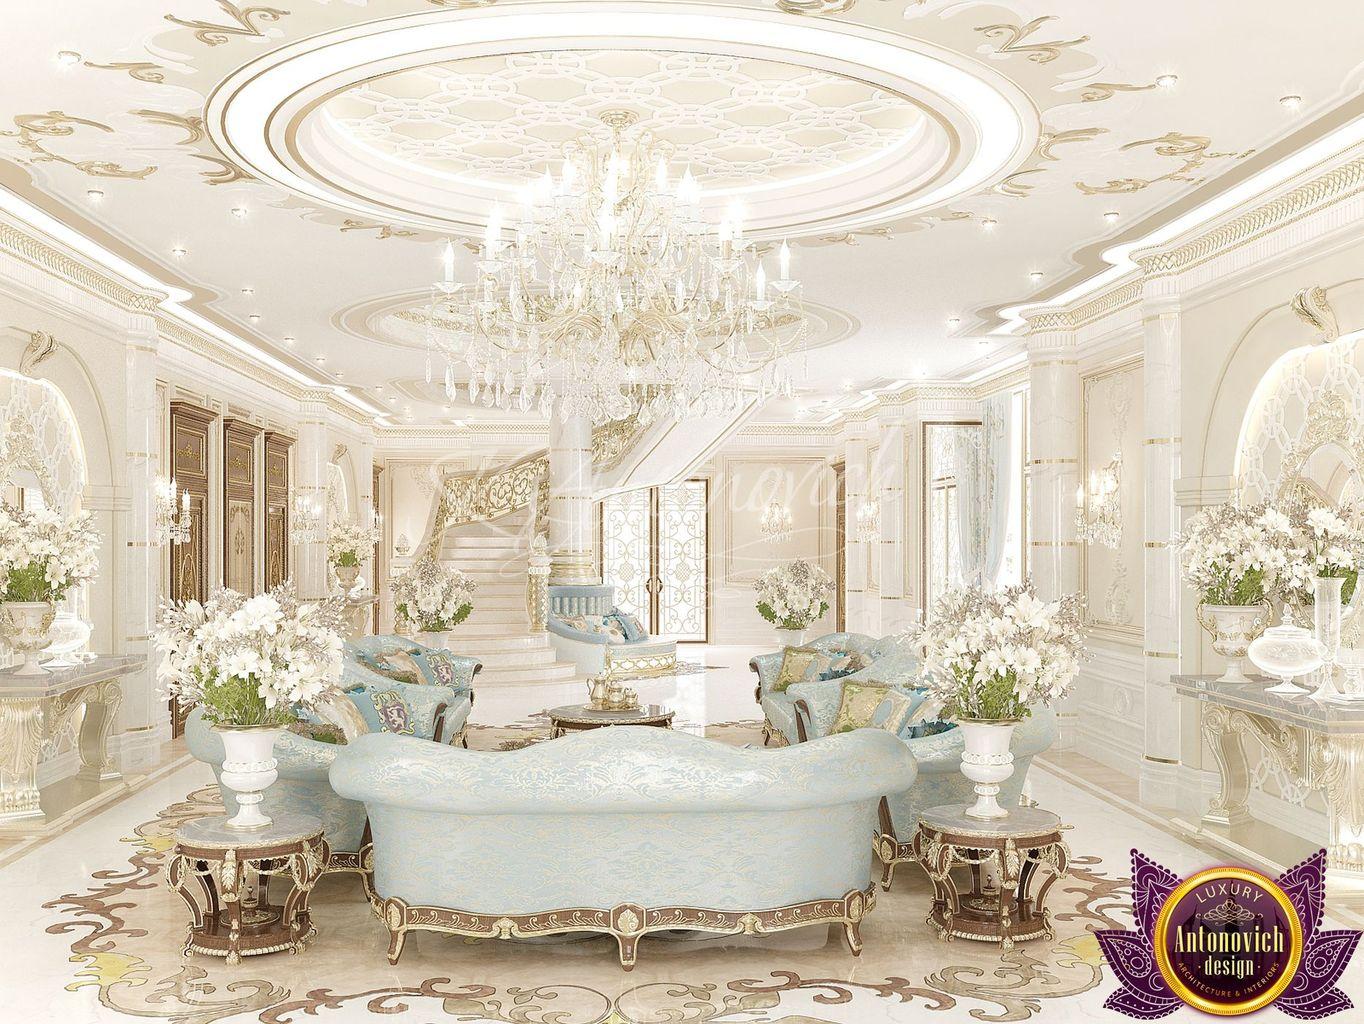 Congo Interior Design: Royal interiors by Katrina Antonovich